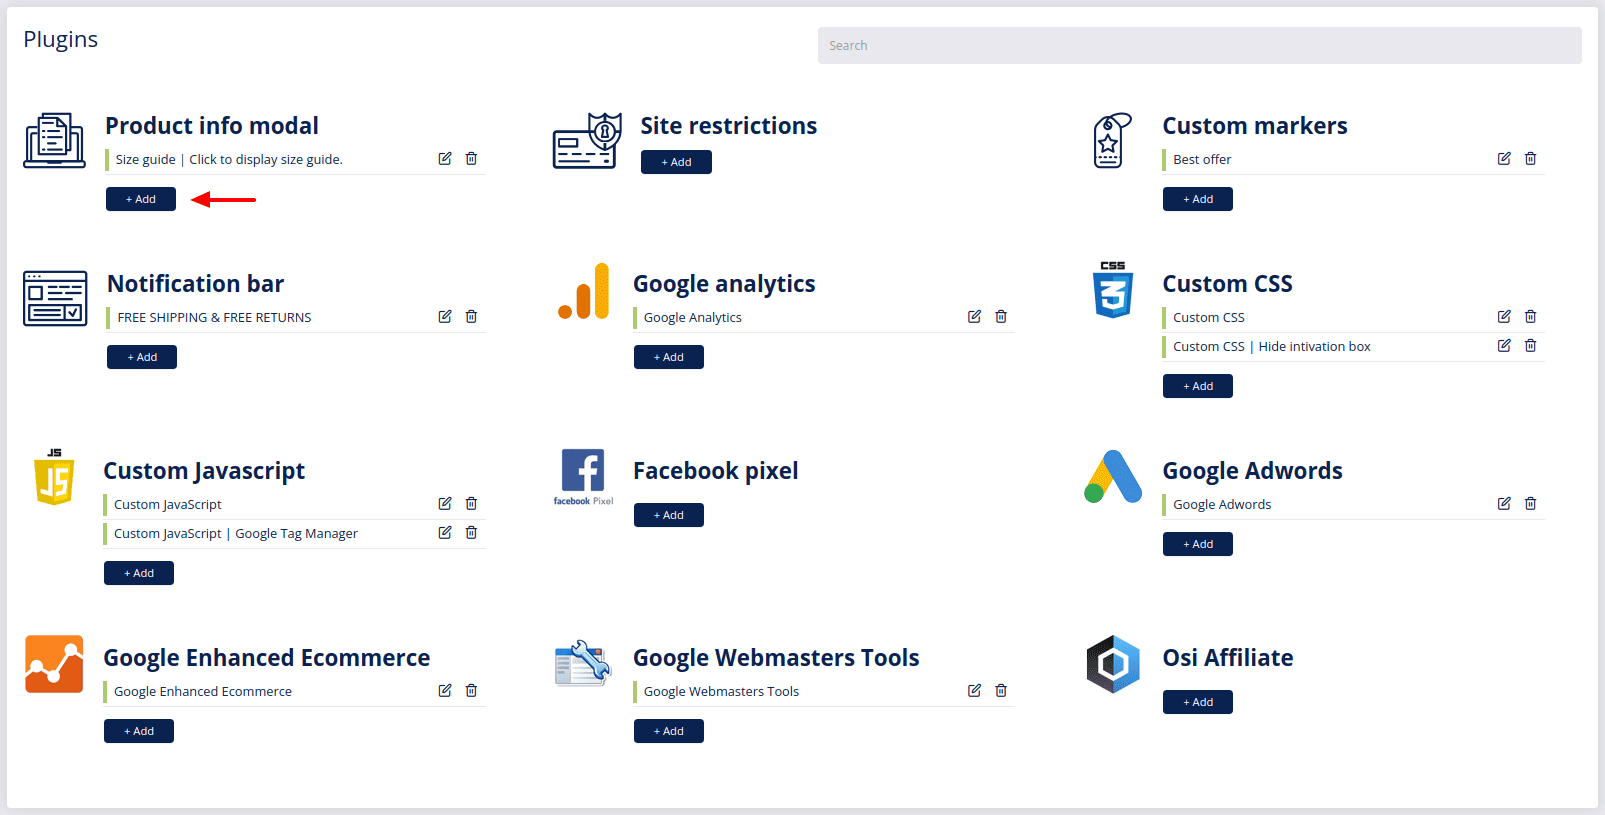 plugins product info modal add